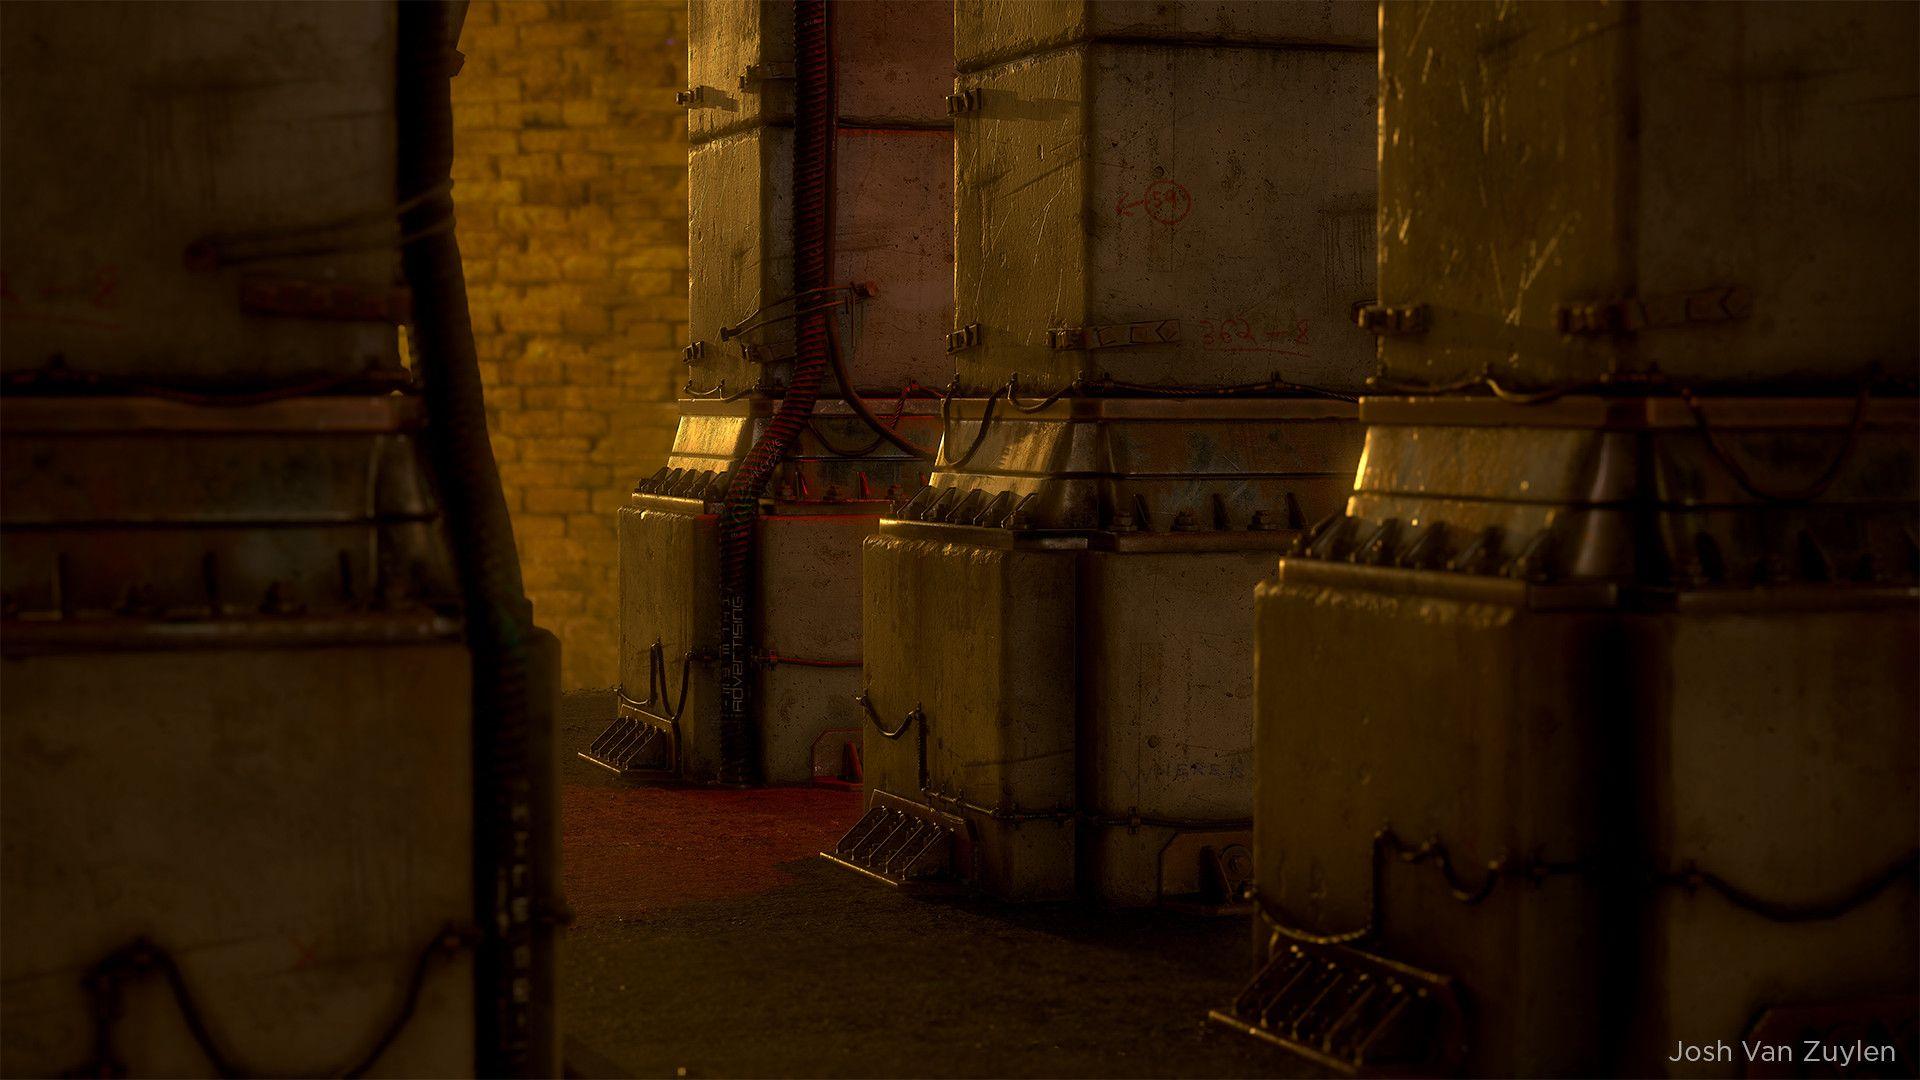 ArtStation - Blade Runner/Cyberpunk - Concrete Pillar, Josh Van Zuylen